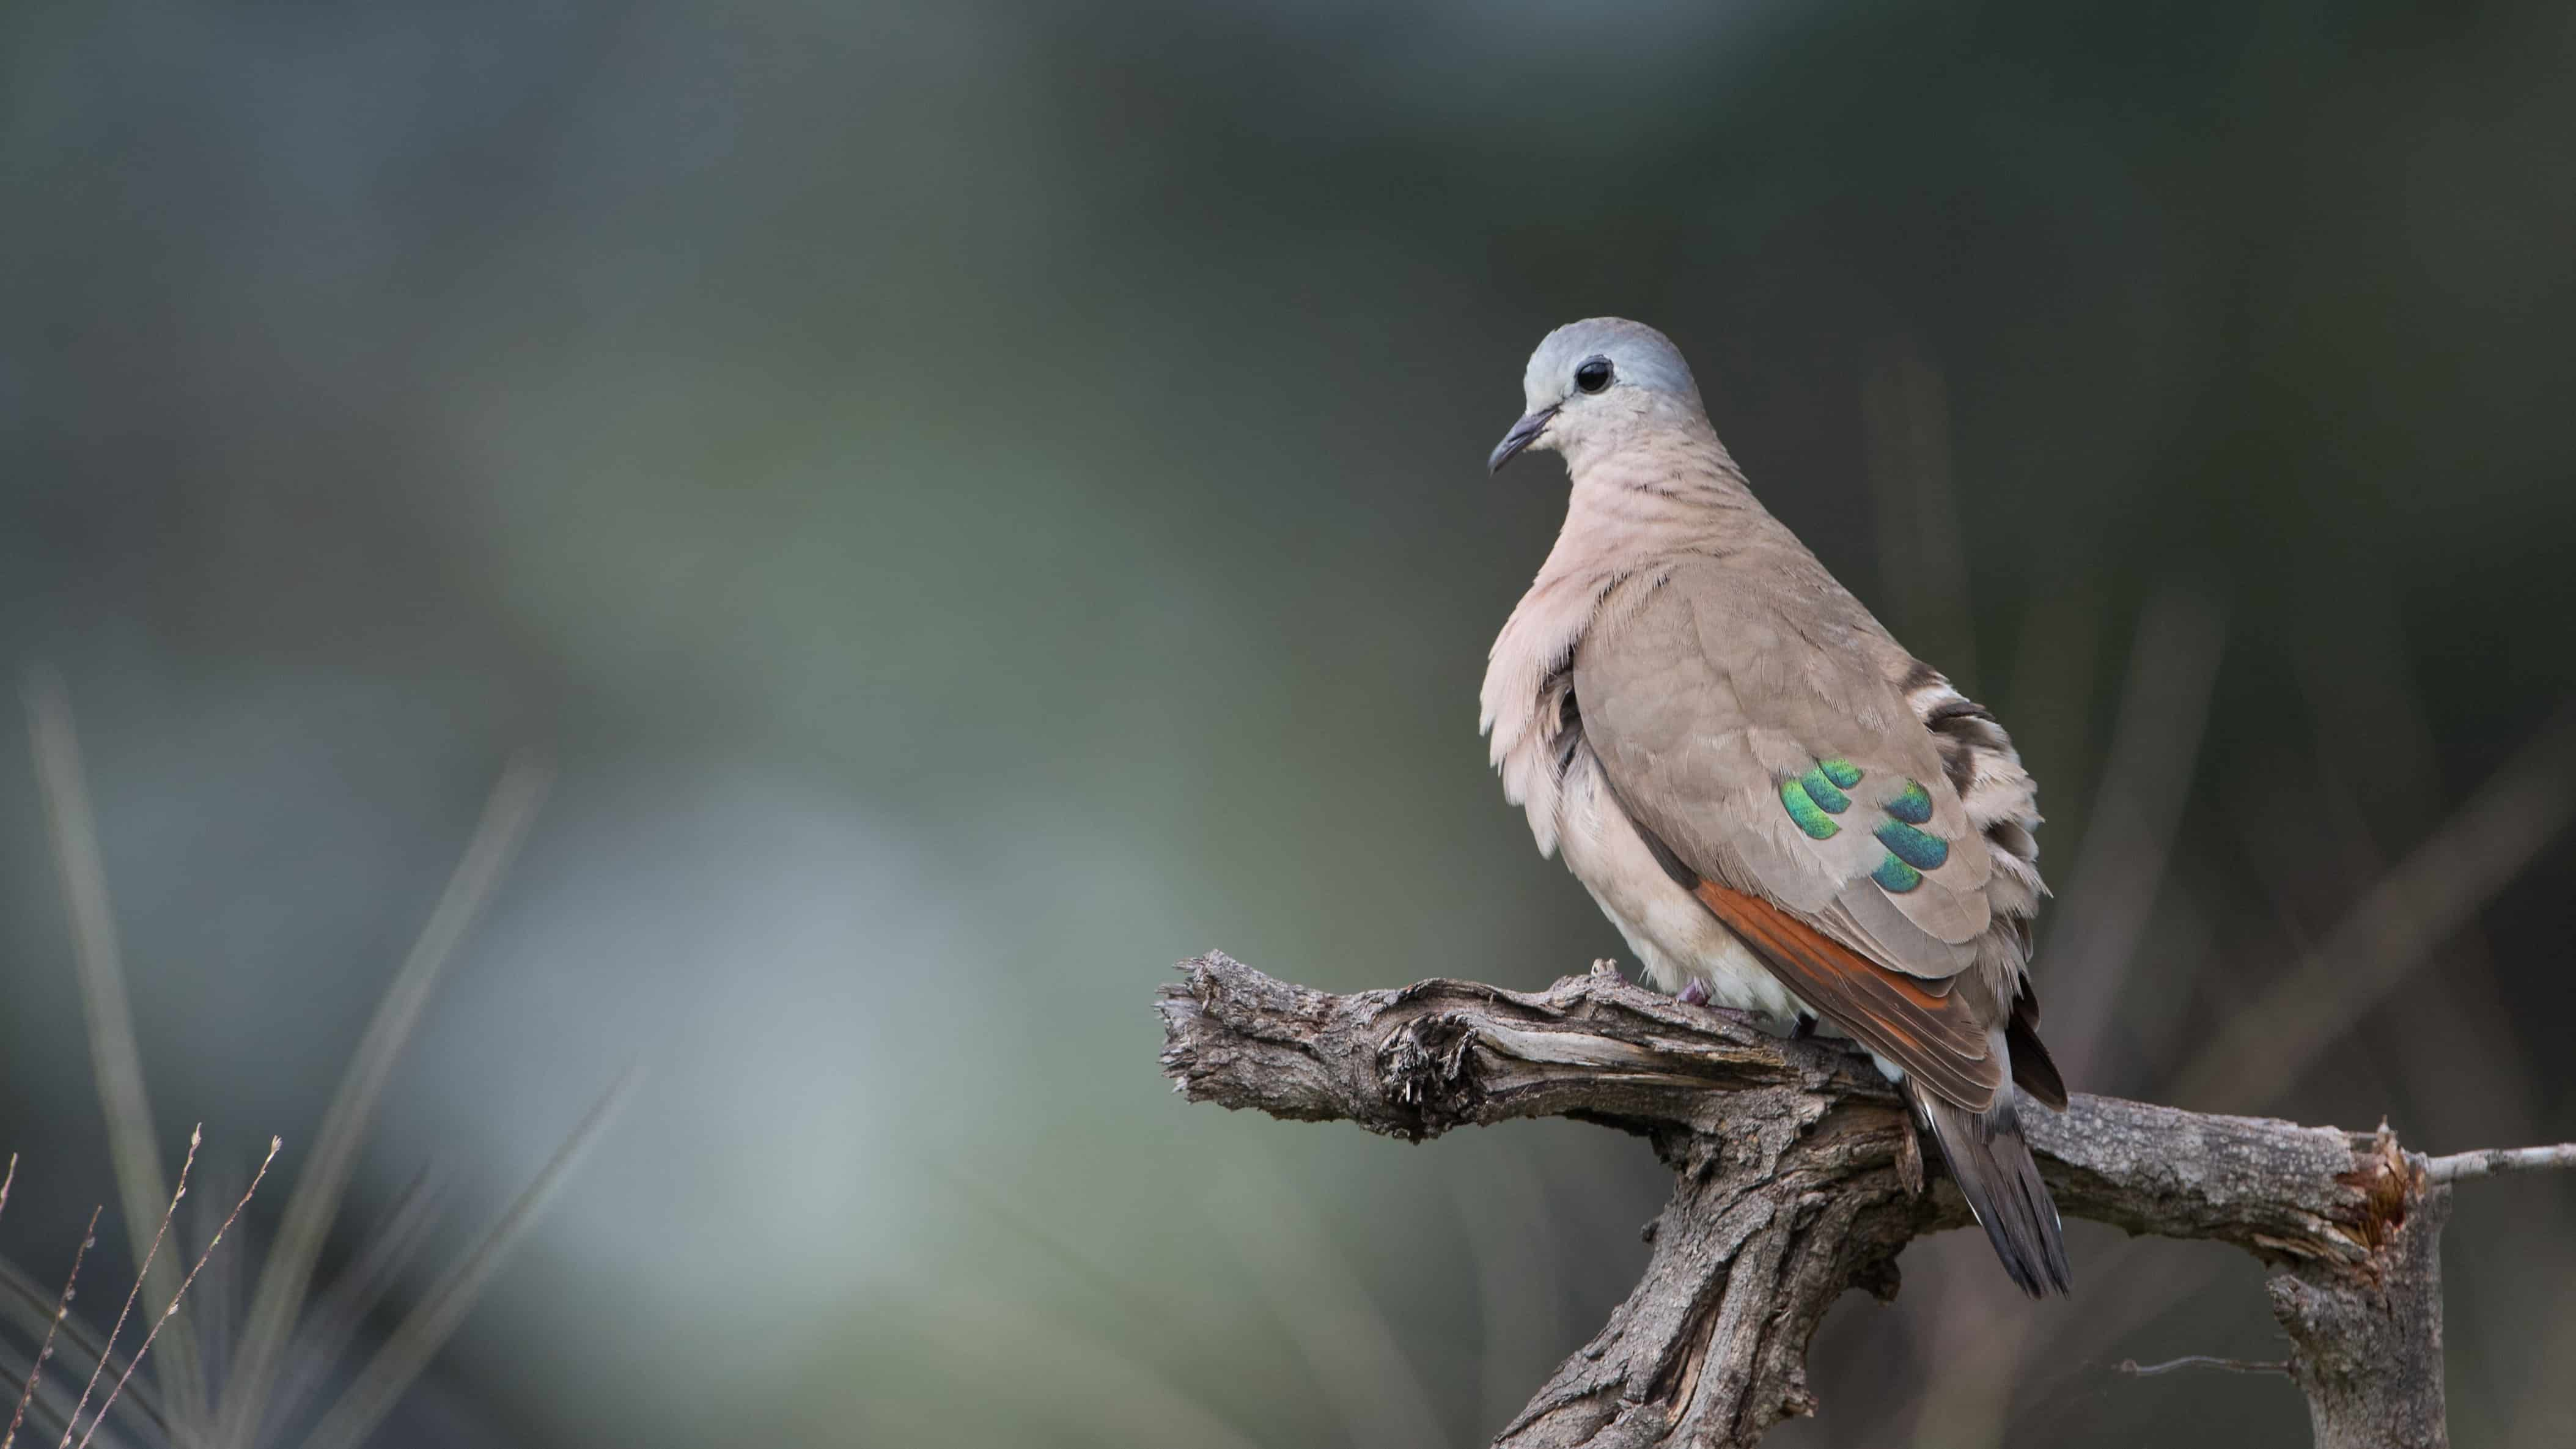 Emerld-spotted Wood Dove DSC_2350_adobespark